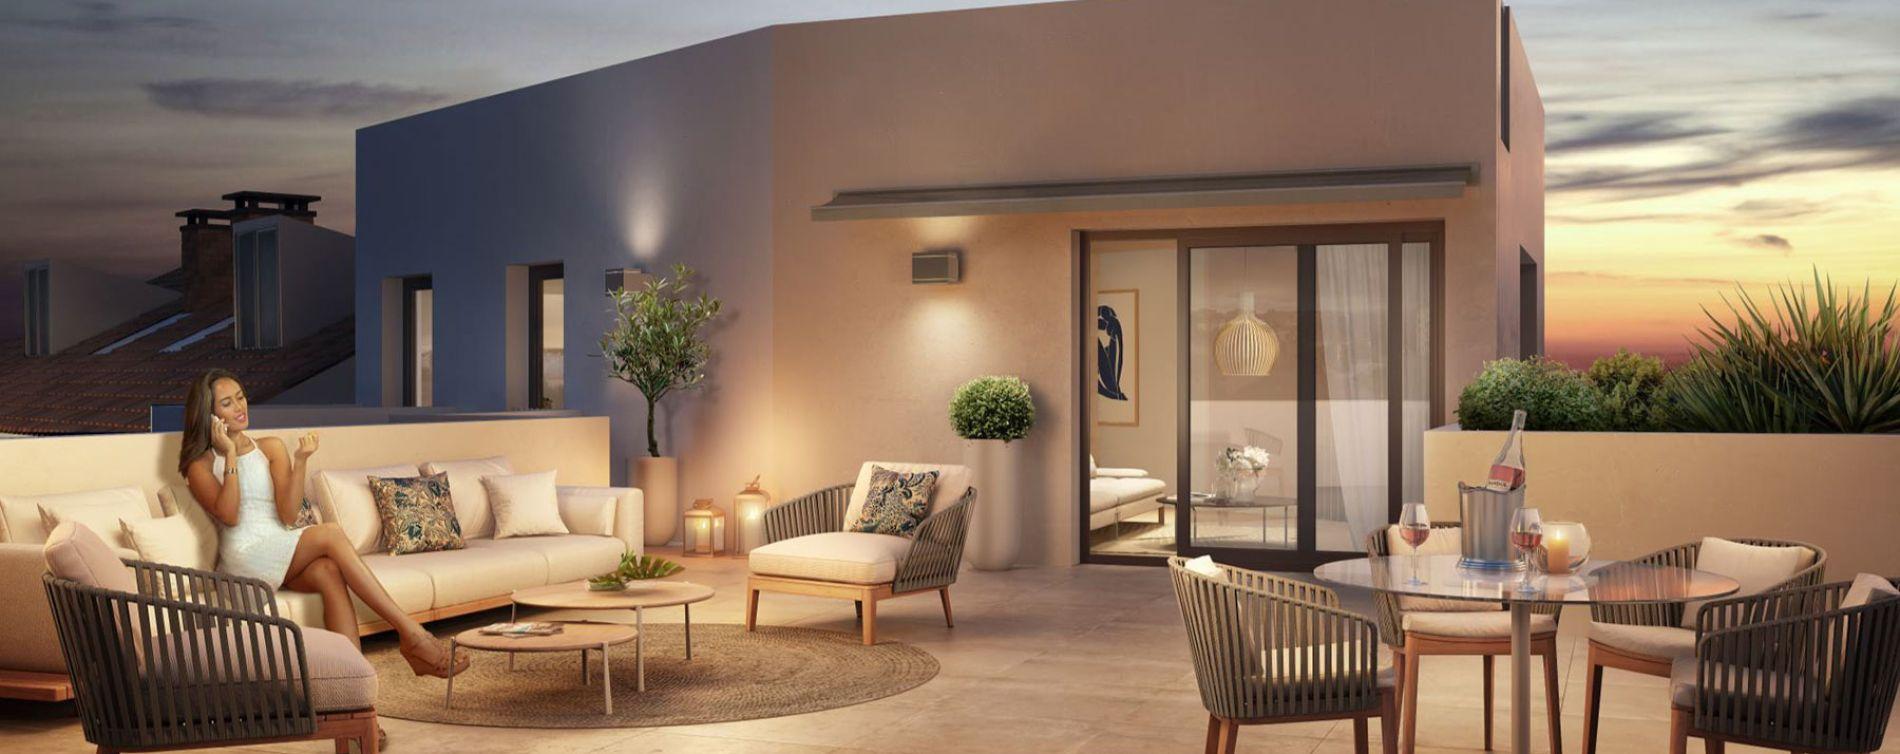 Lyon : programme immobilier neuve « Villa Lucia » (2)